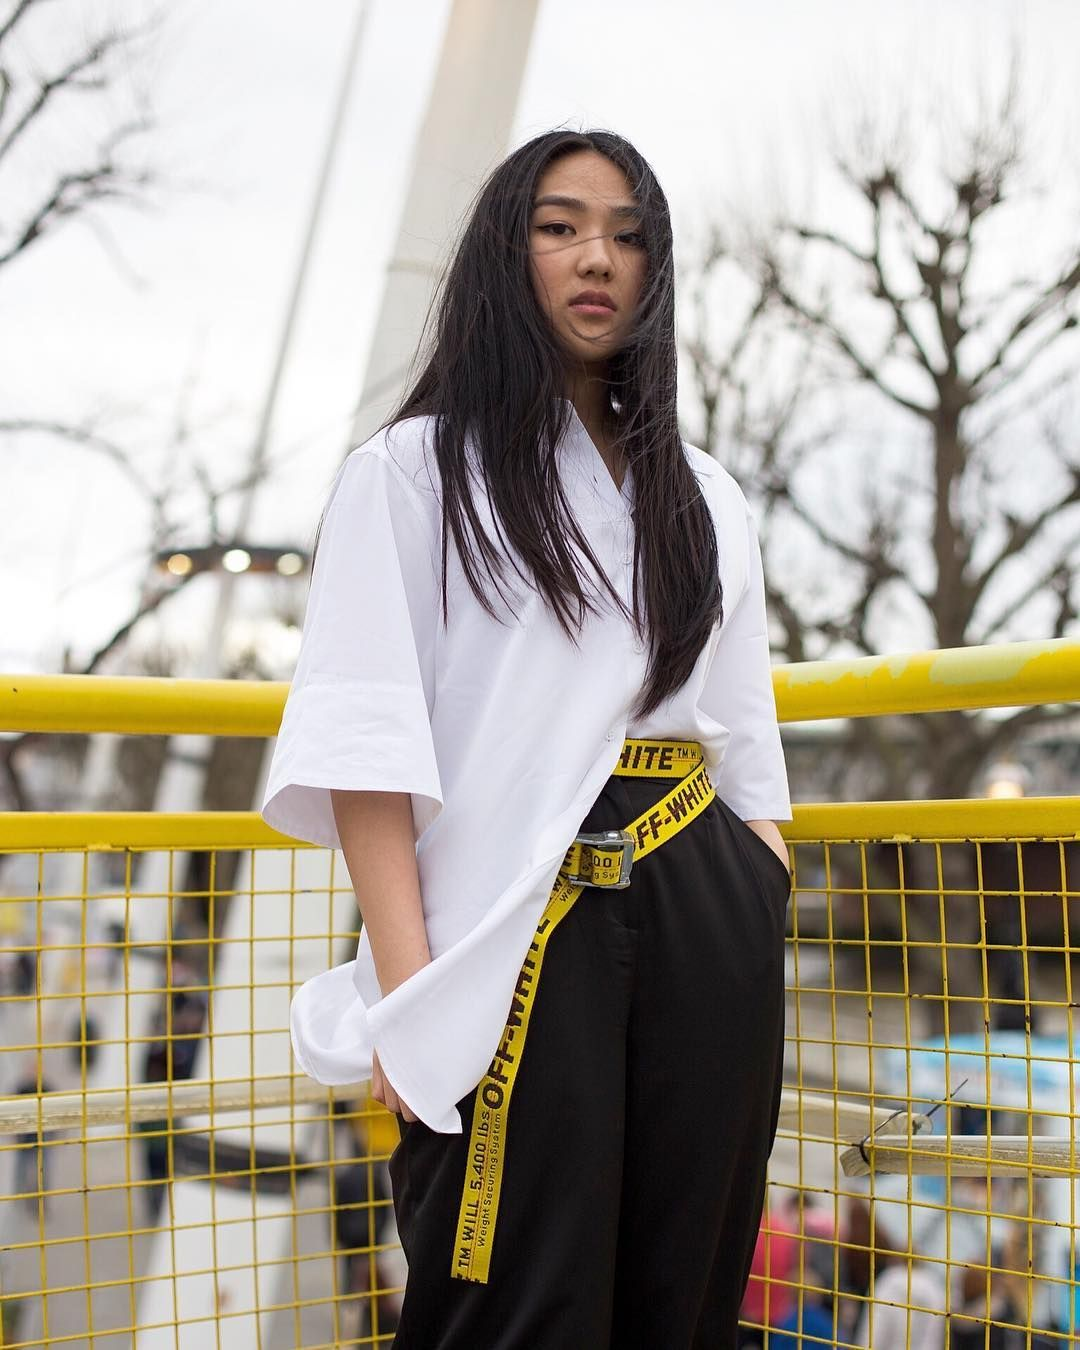 a63a53752e1b Pin by Marina Vitzilaiou on Street Style 2018 in 2019